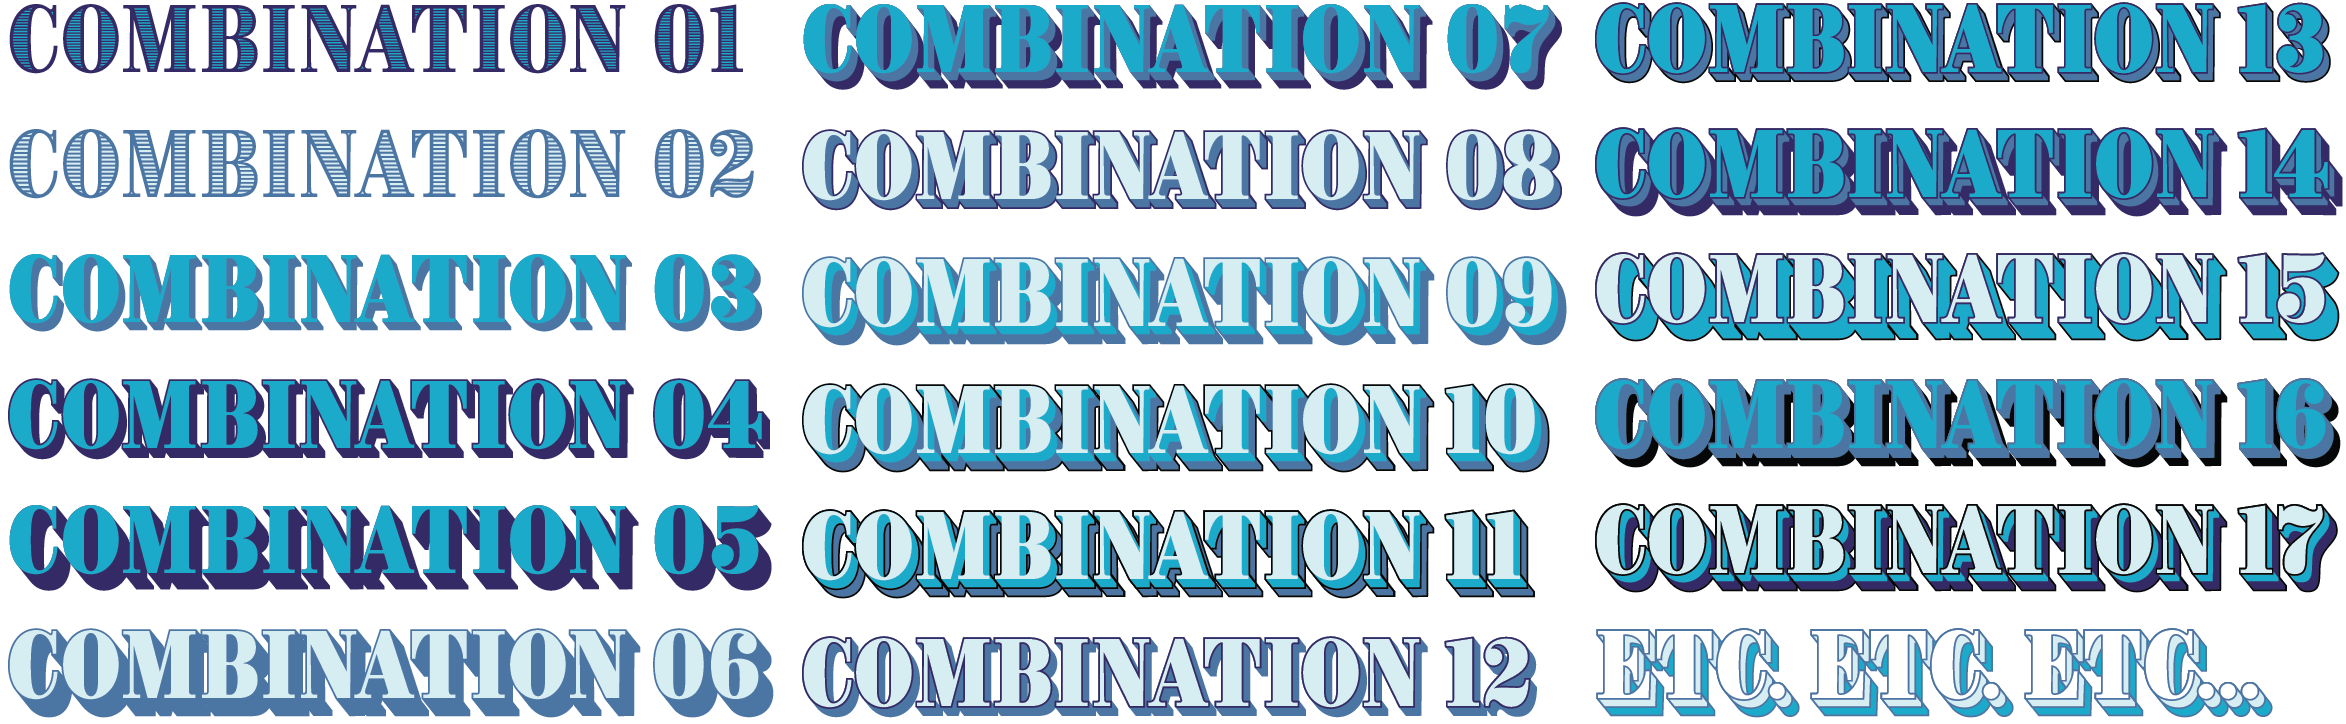 Image-14-variations